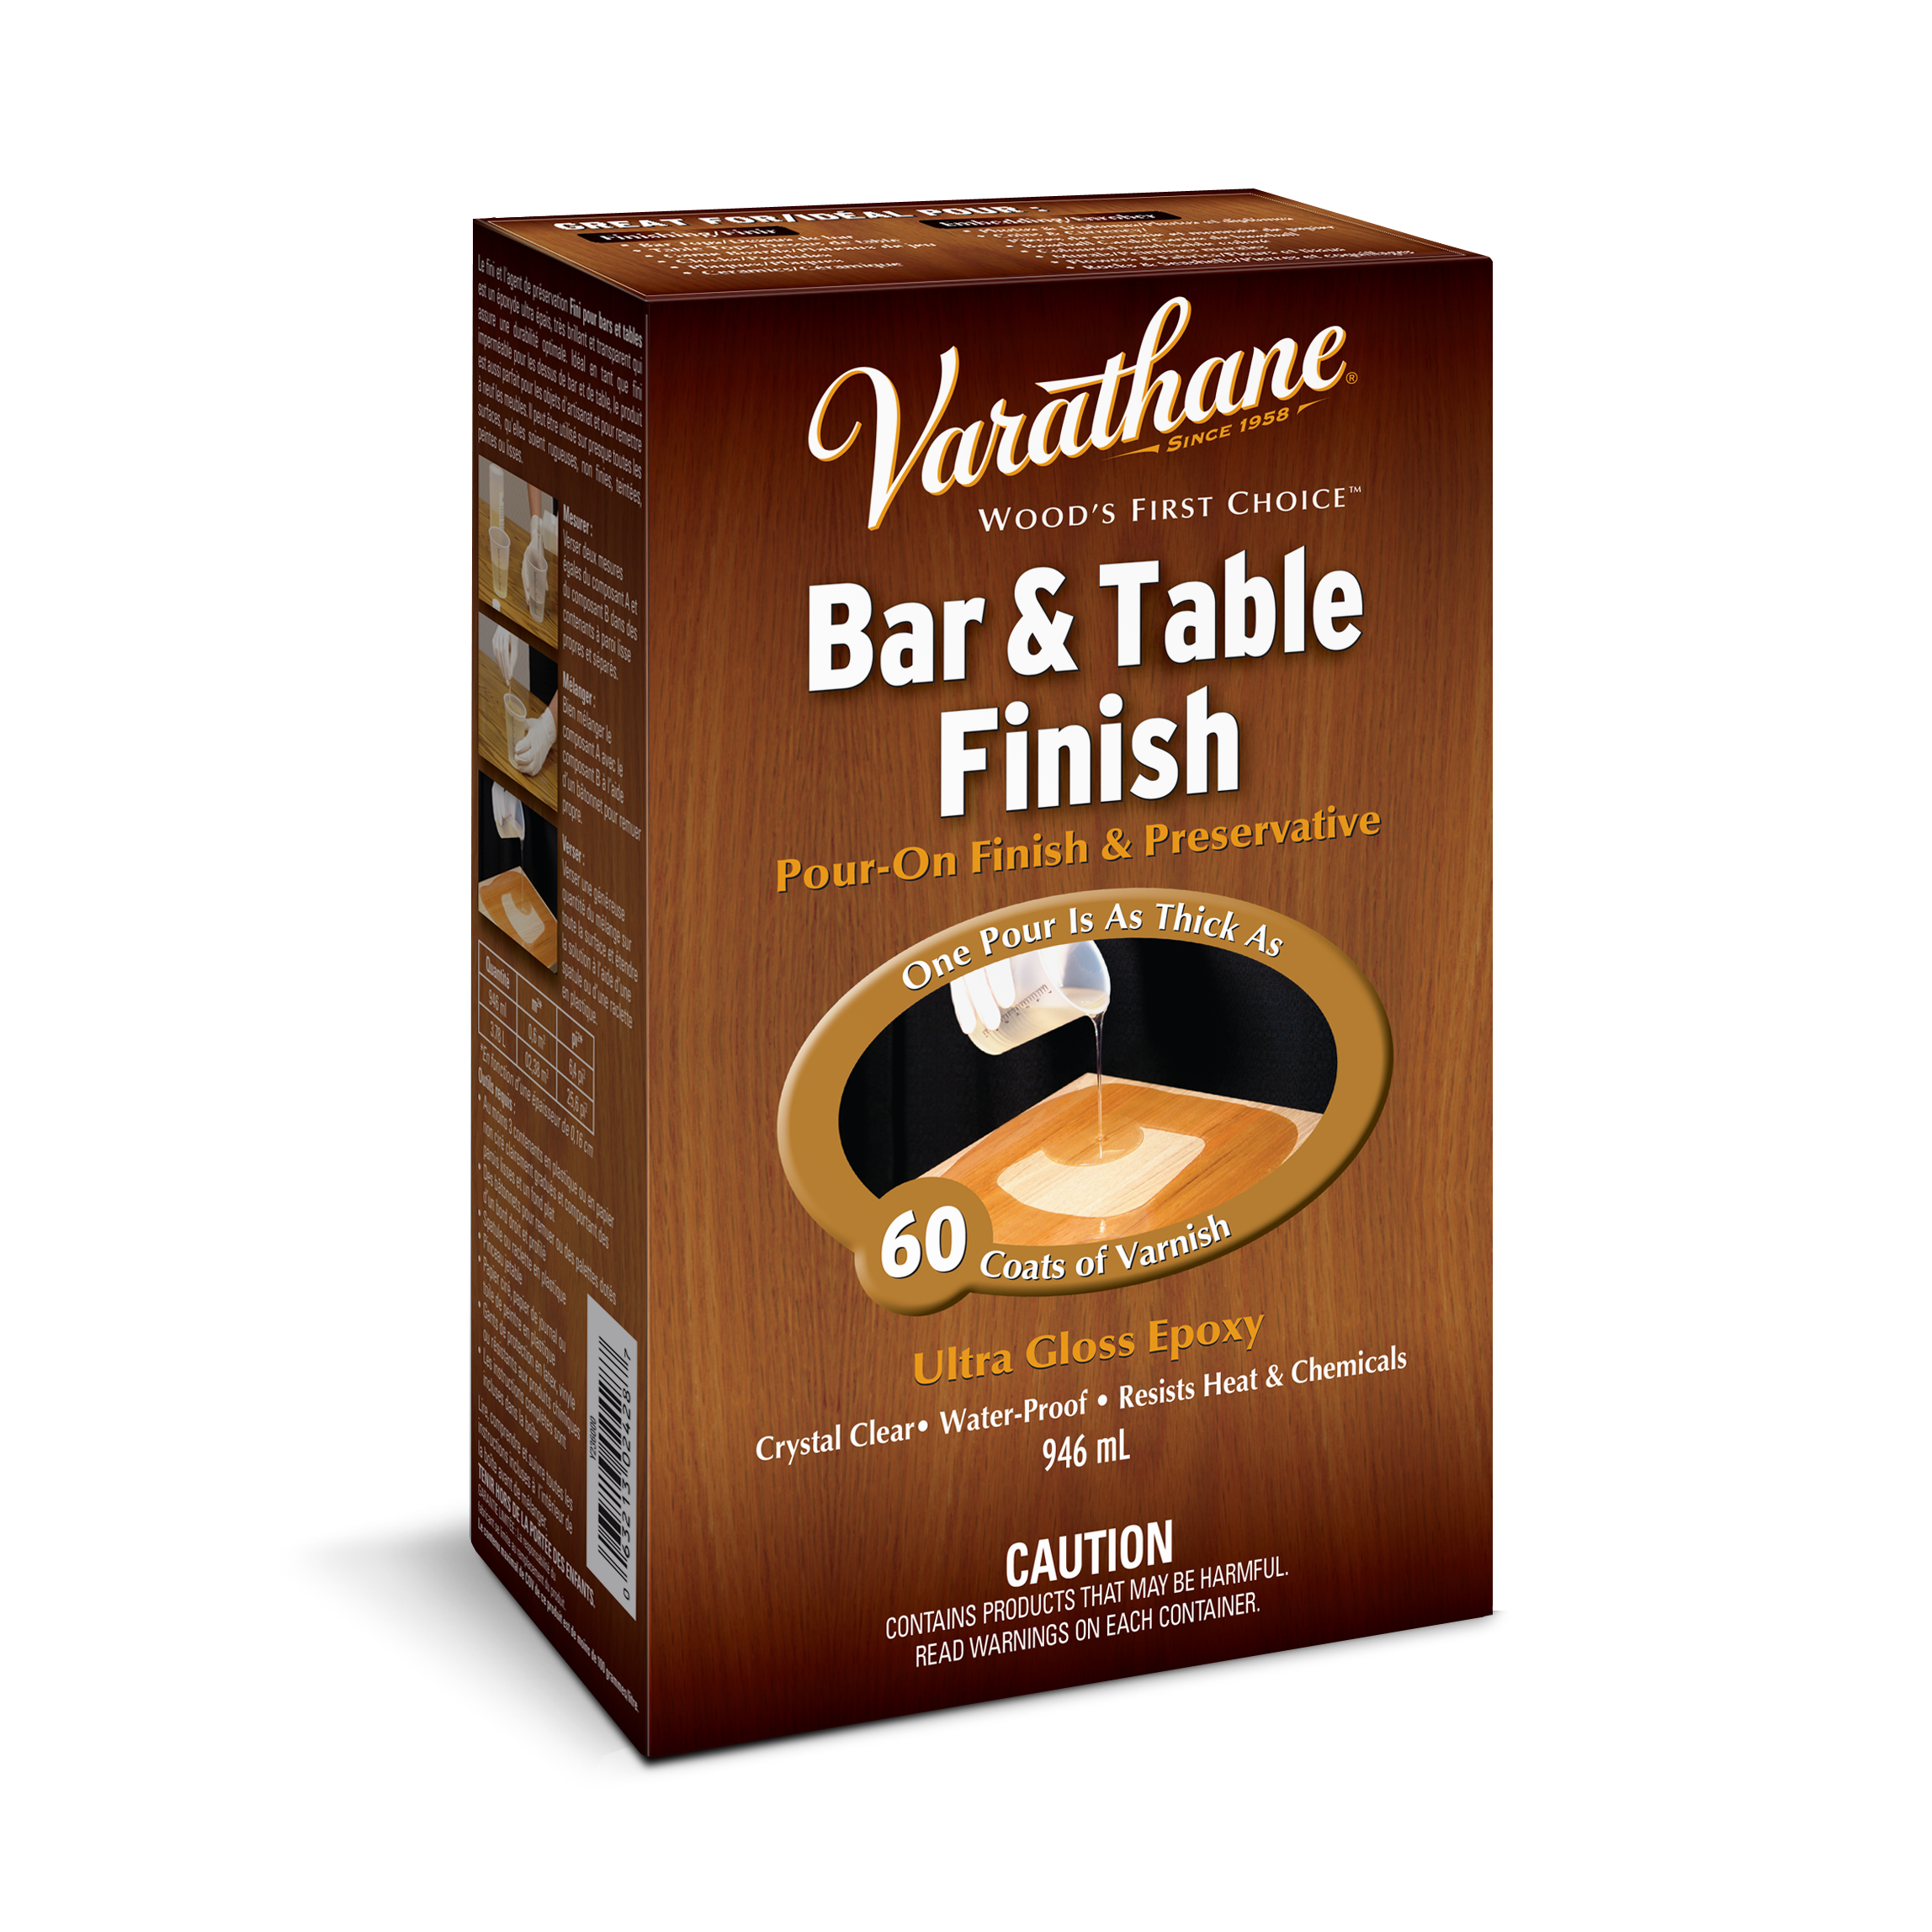 Varathane Bar And Table Finish Brokeasshome Com